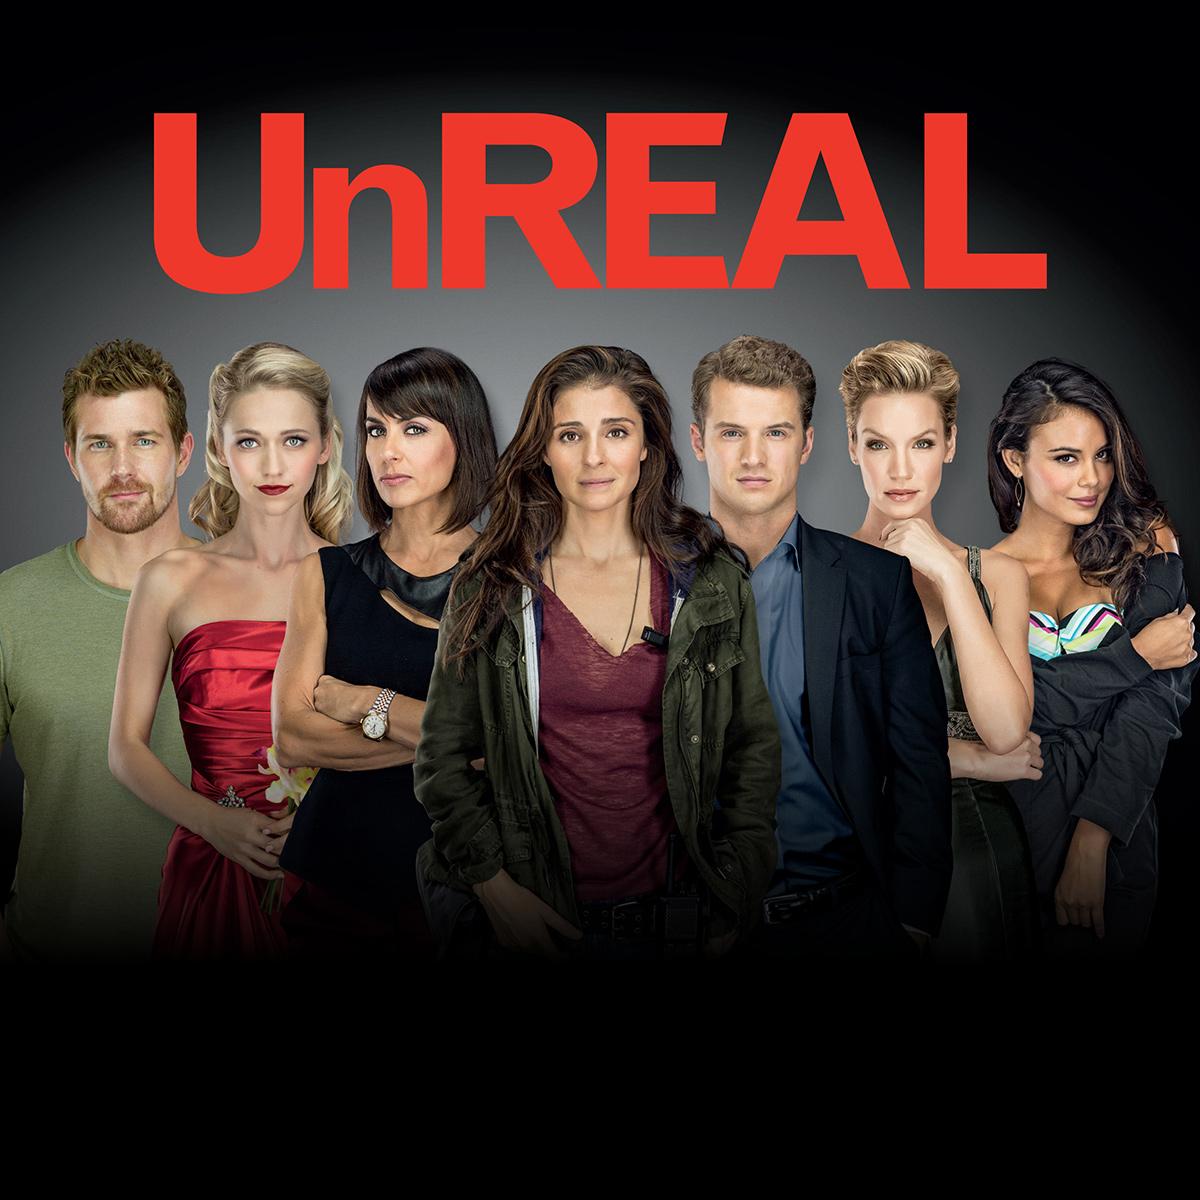 Lucifer Season 4 Episode 1 Youtube: UnREAL Lifetime Promos